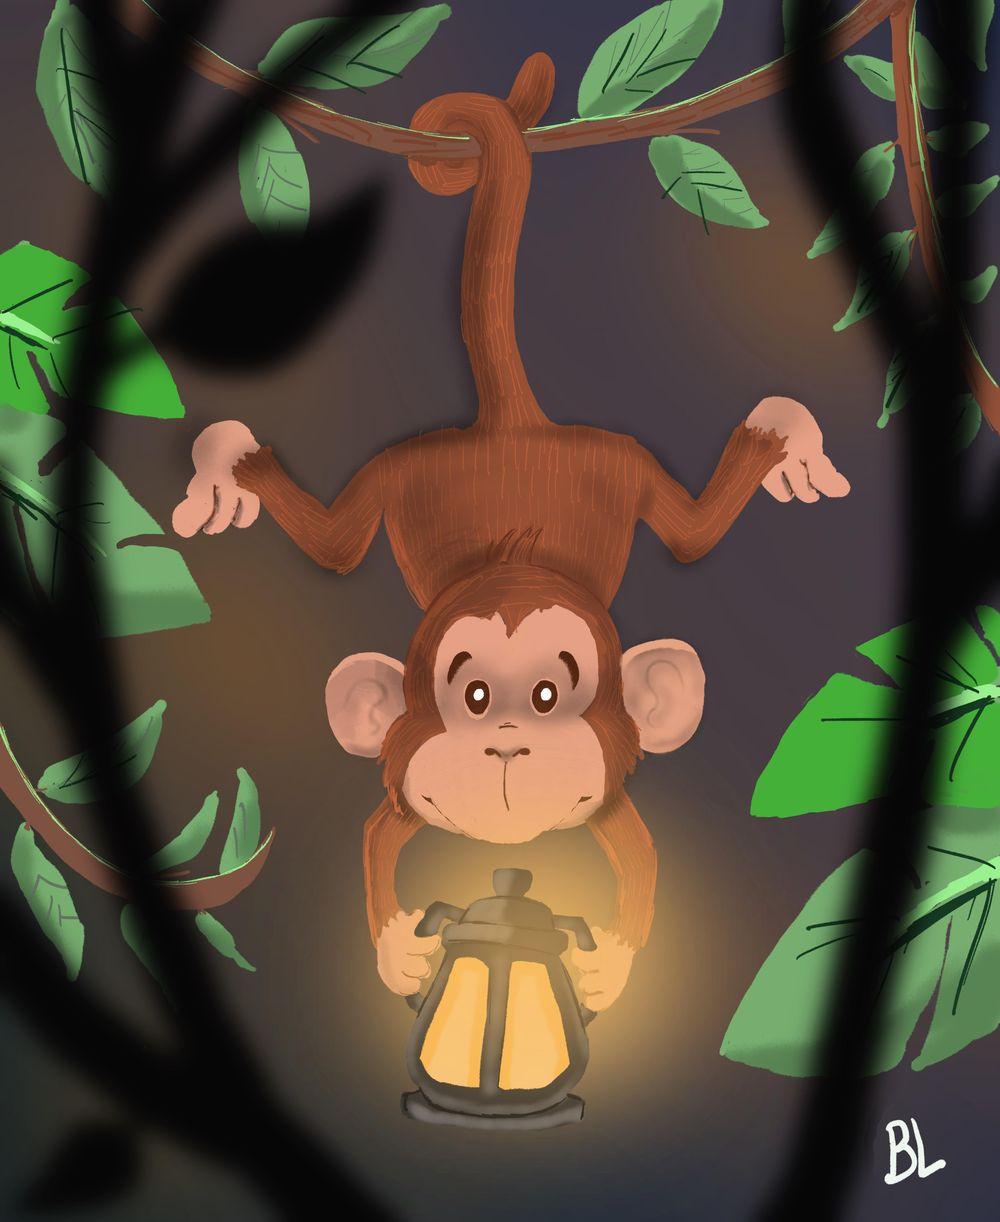 Monkey - image 1 - student project